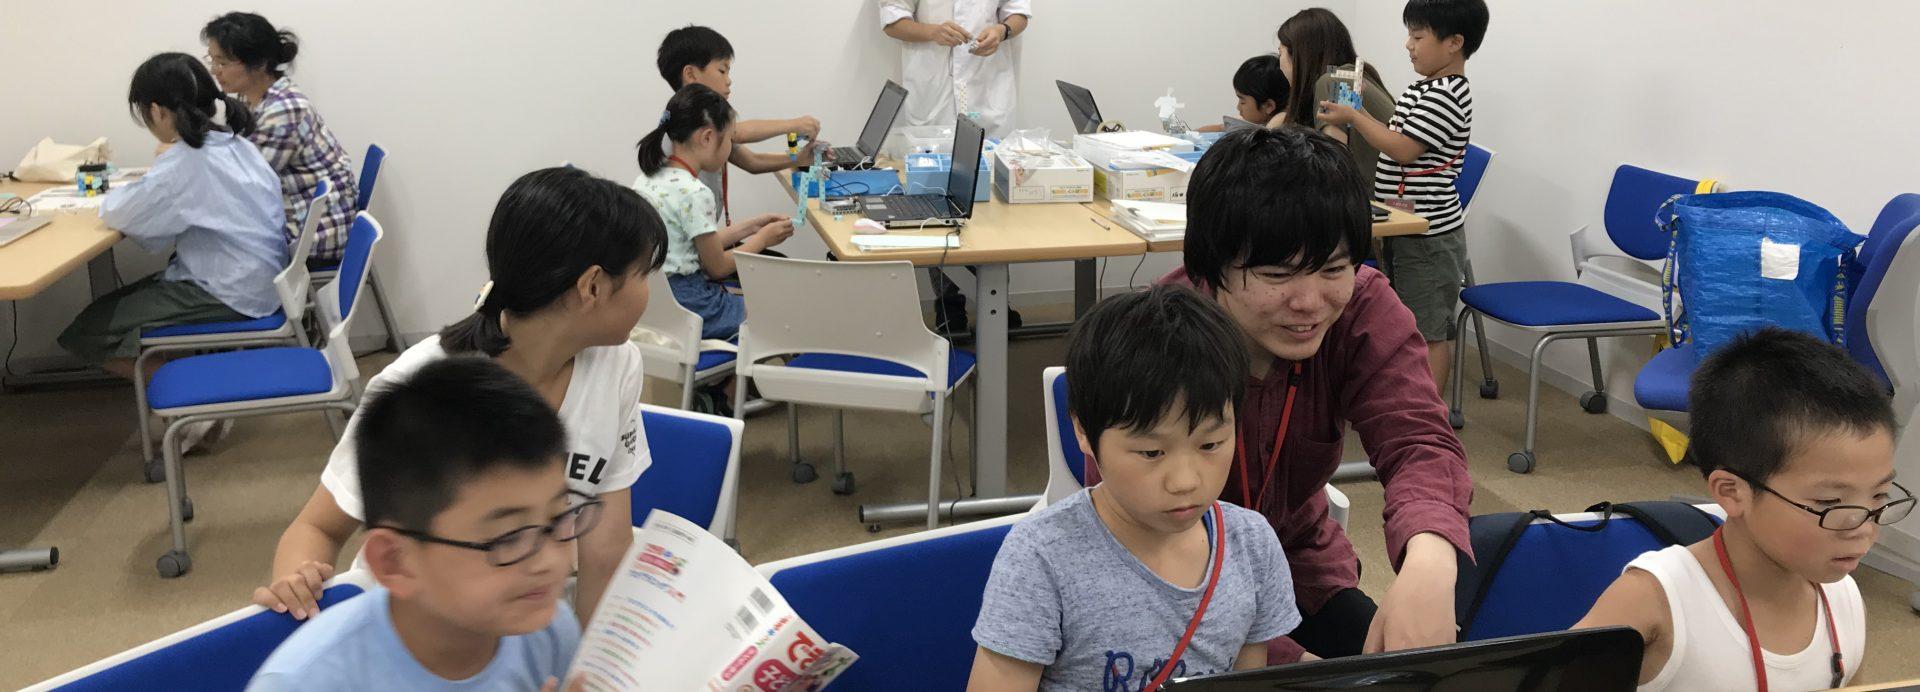 Kids プログラミング && サイエンス教室 コーディエンス